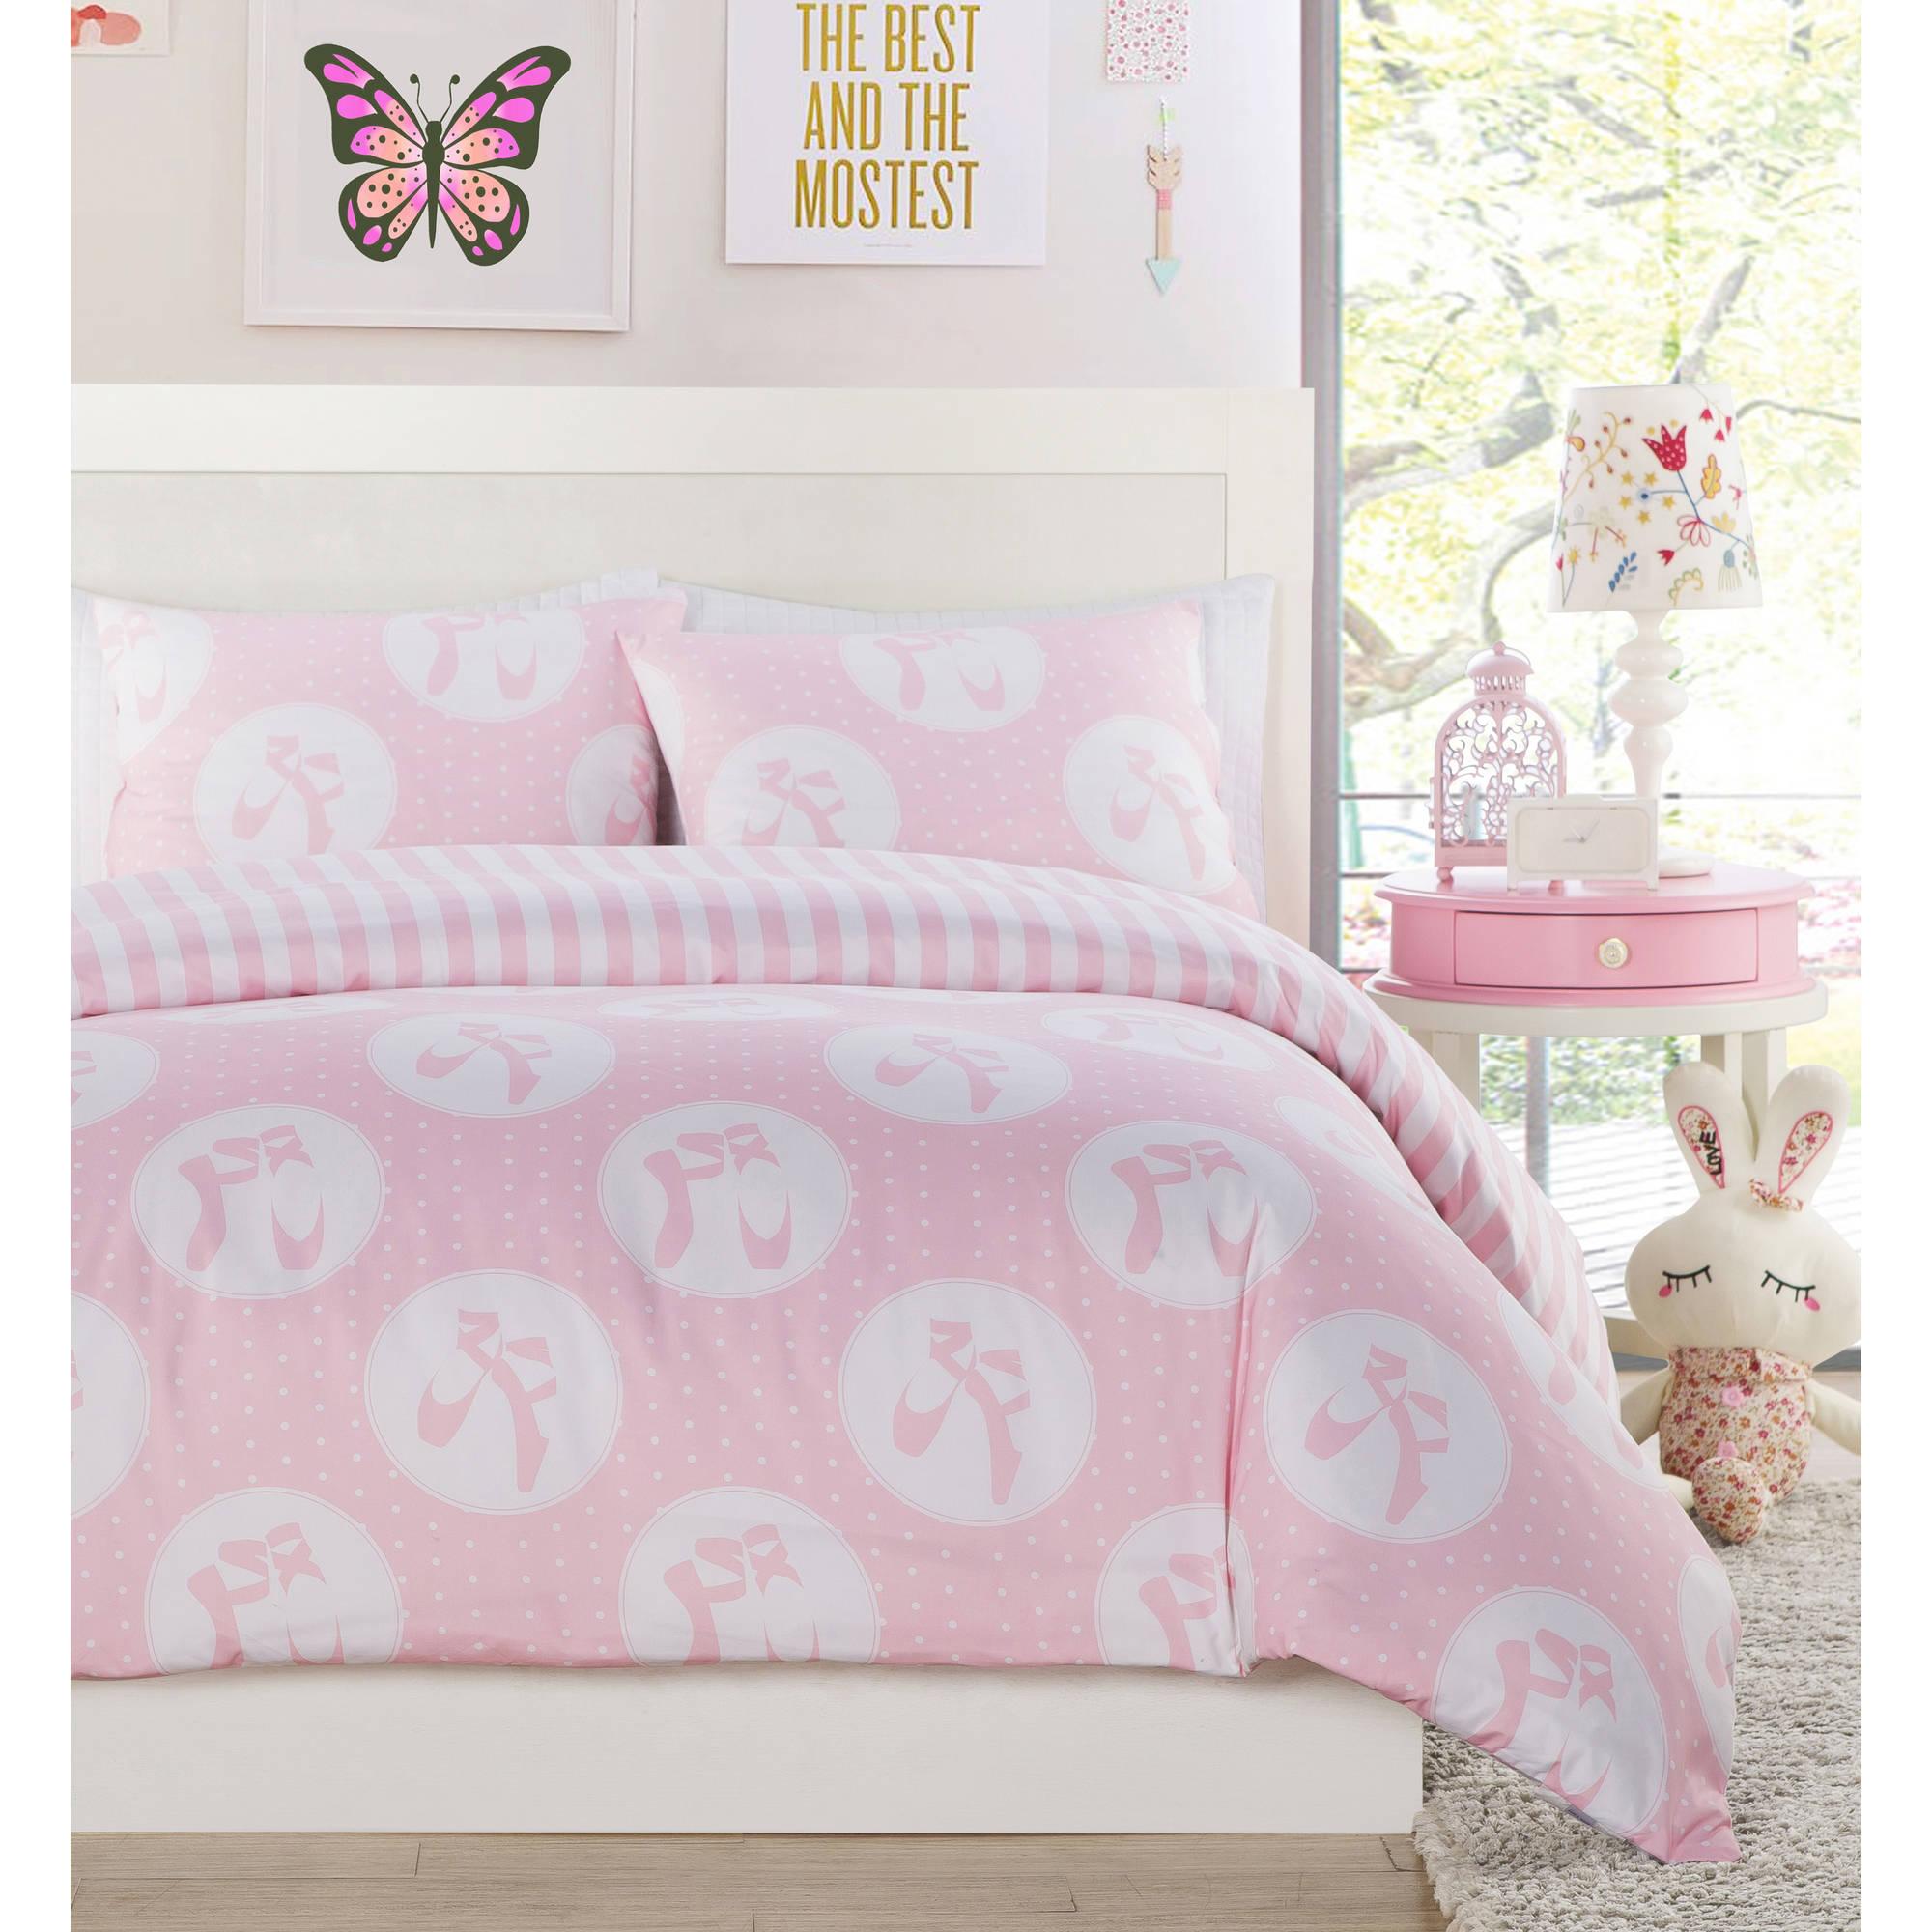 Plie Dot 3Pc Comforter Set